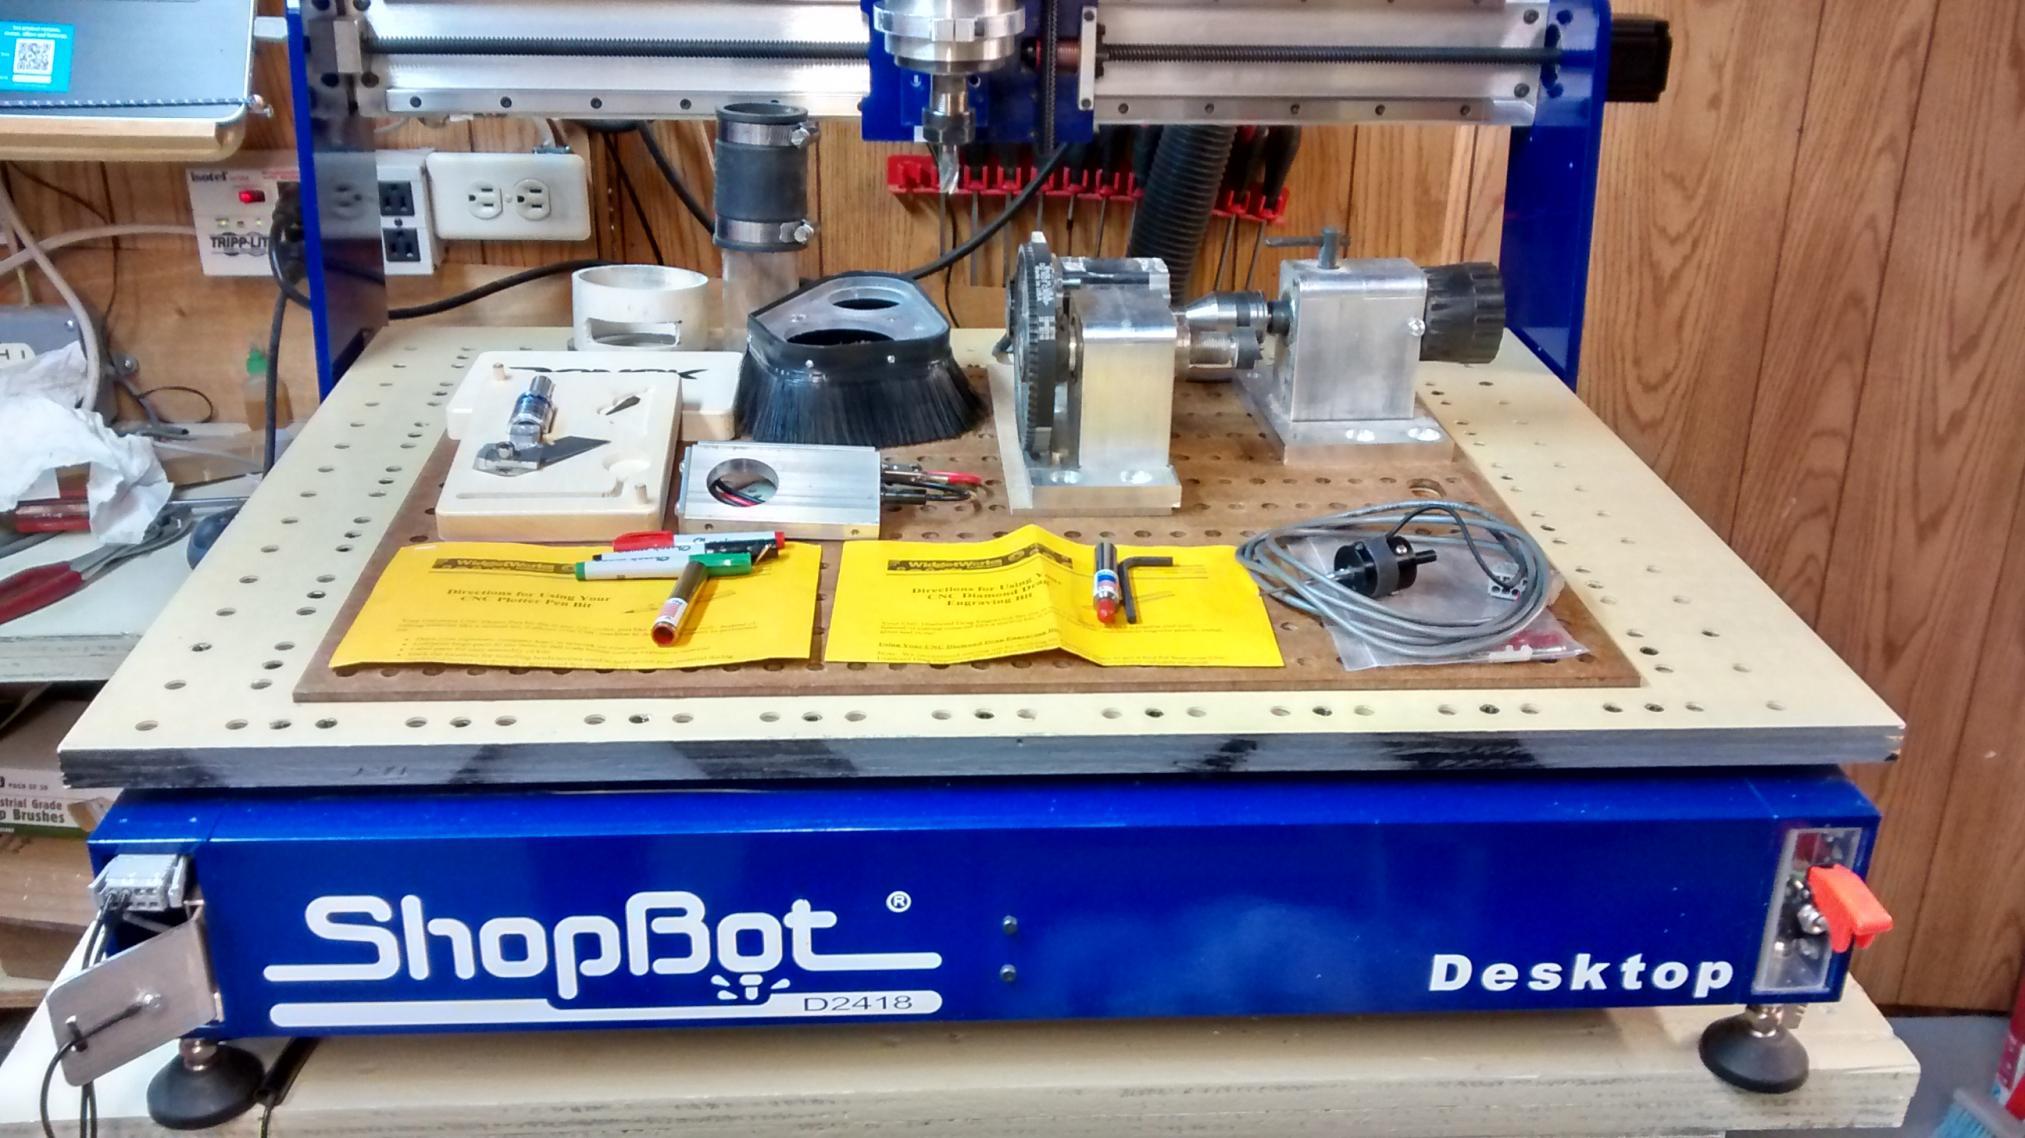 Miraculous Shopbot Desktop 5 1 2 Z Indexer Accessaries Interior Design Ideas Inamawefileorg